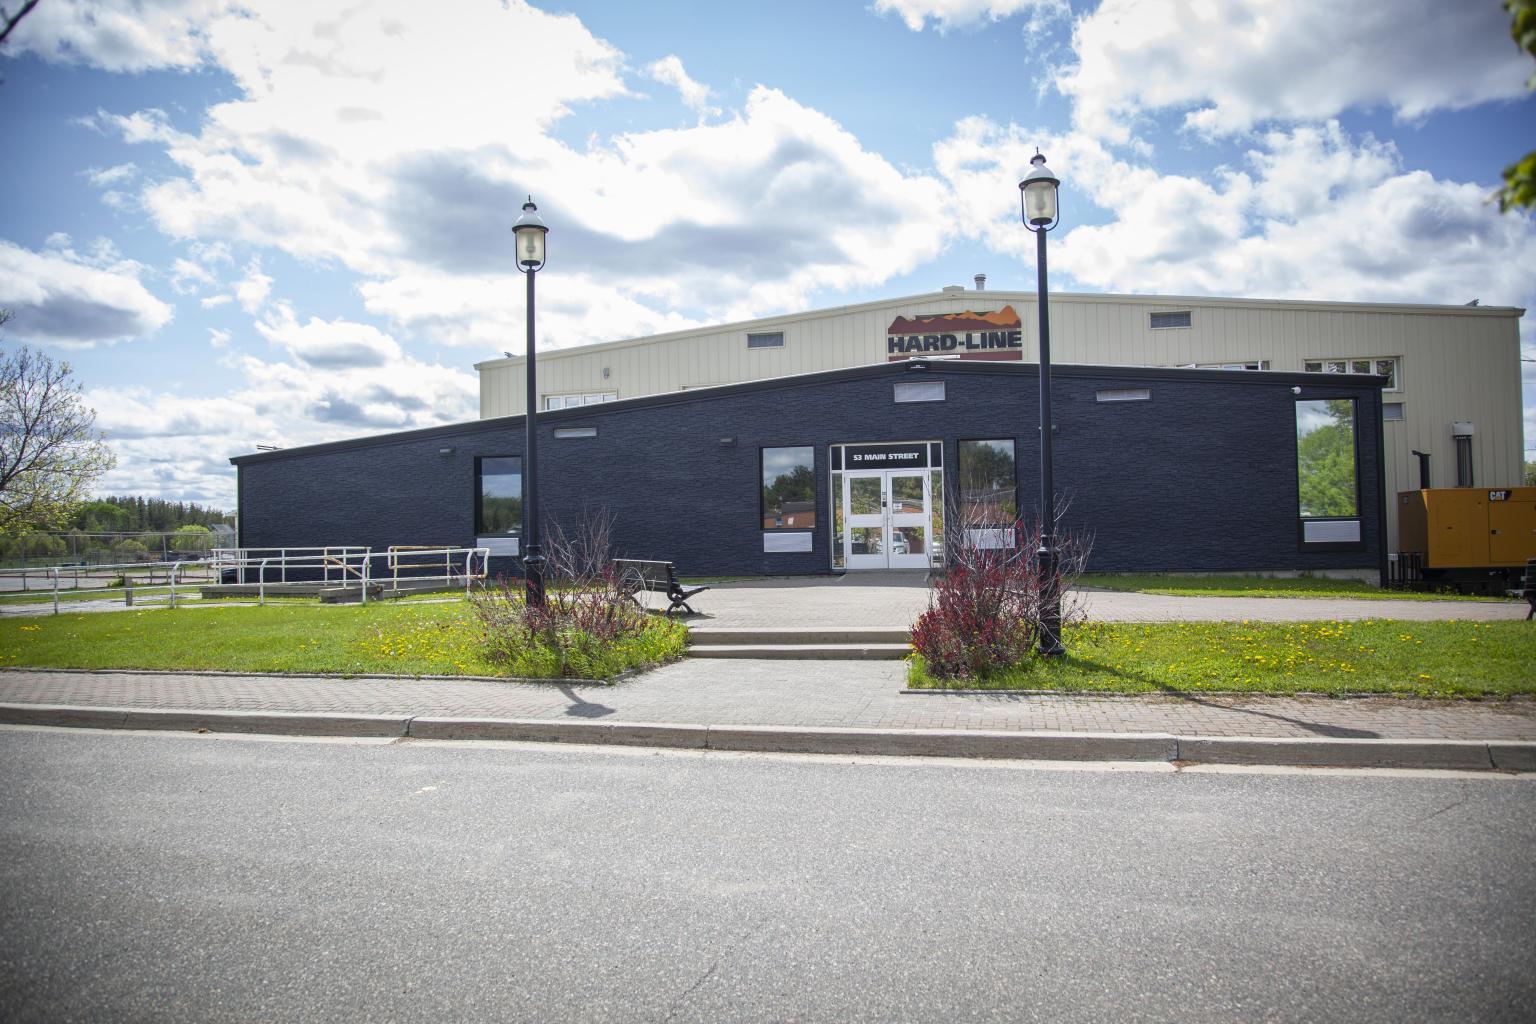 Summer Hard-Line Headquarters: HARD-LINE headquarters in Sudbury, Ontario, Canada.